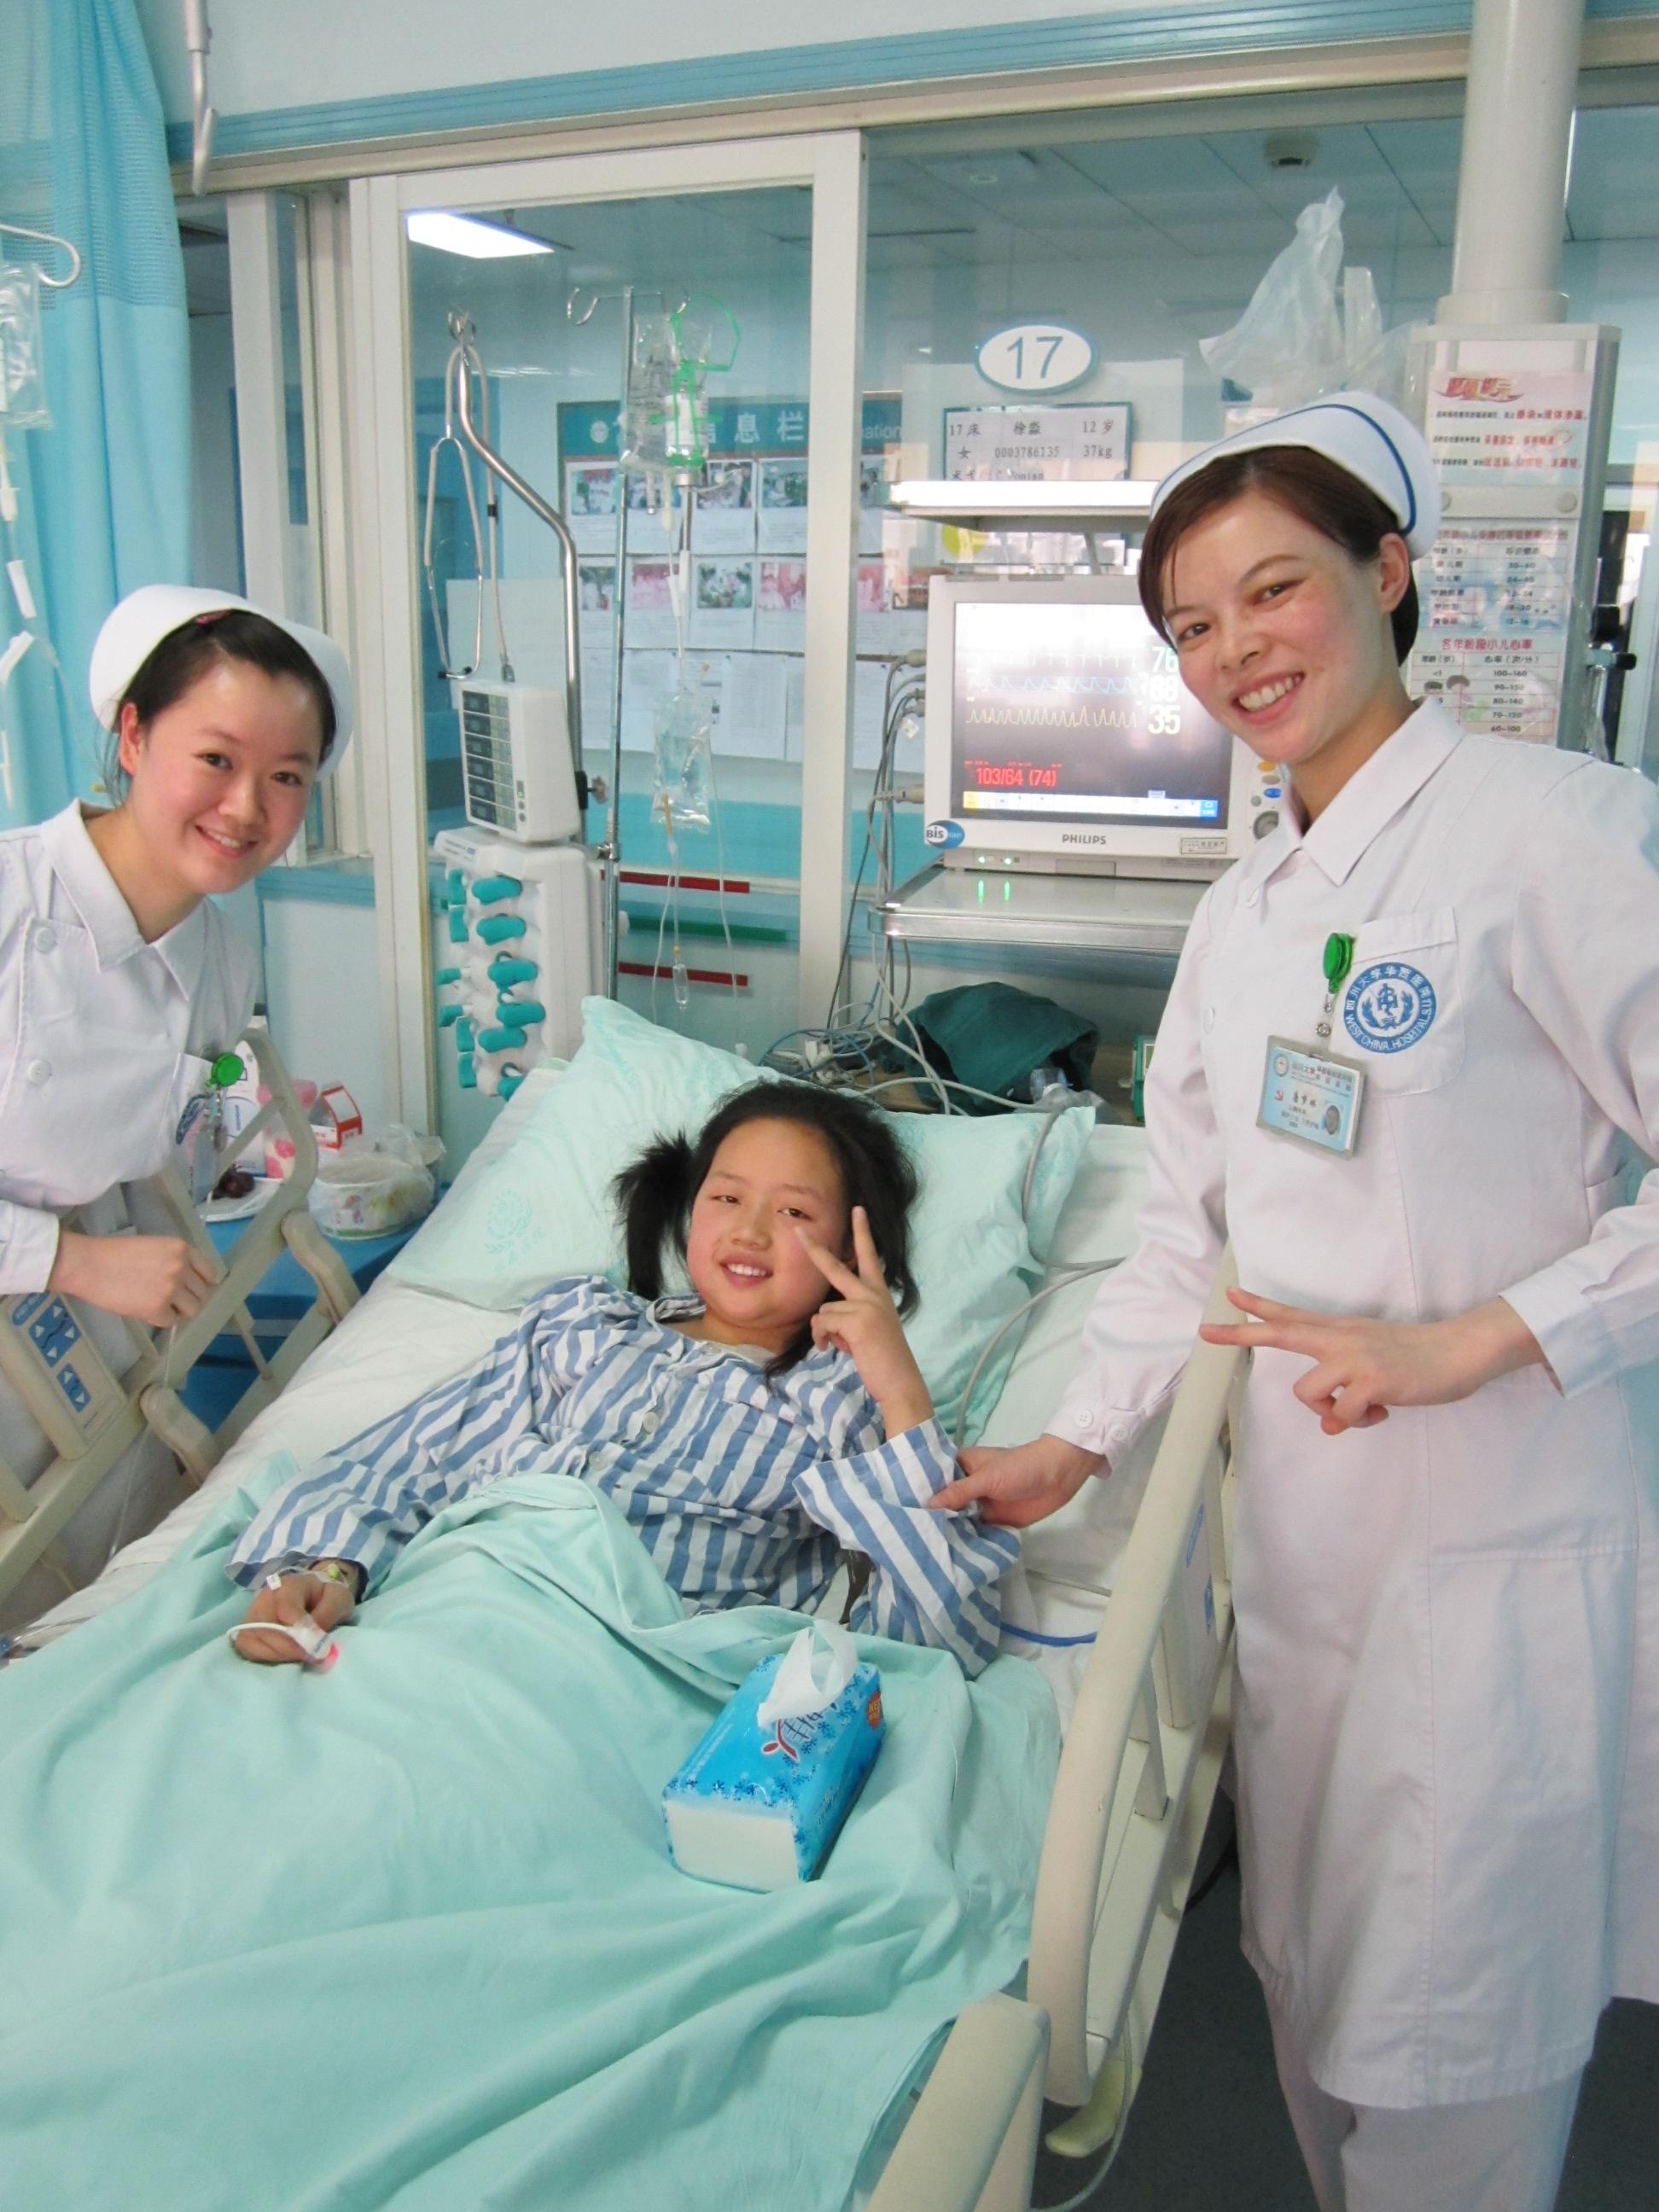 China sichuan chengdu girl webcam chinese - 2 2